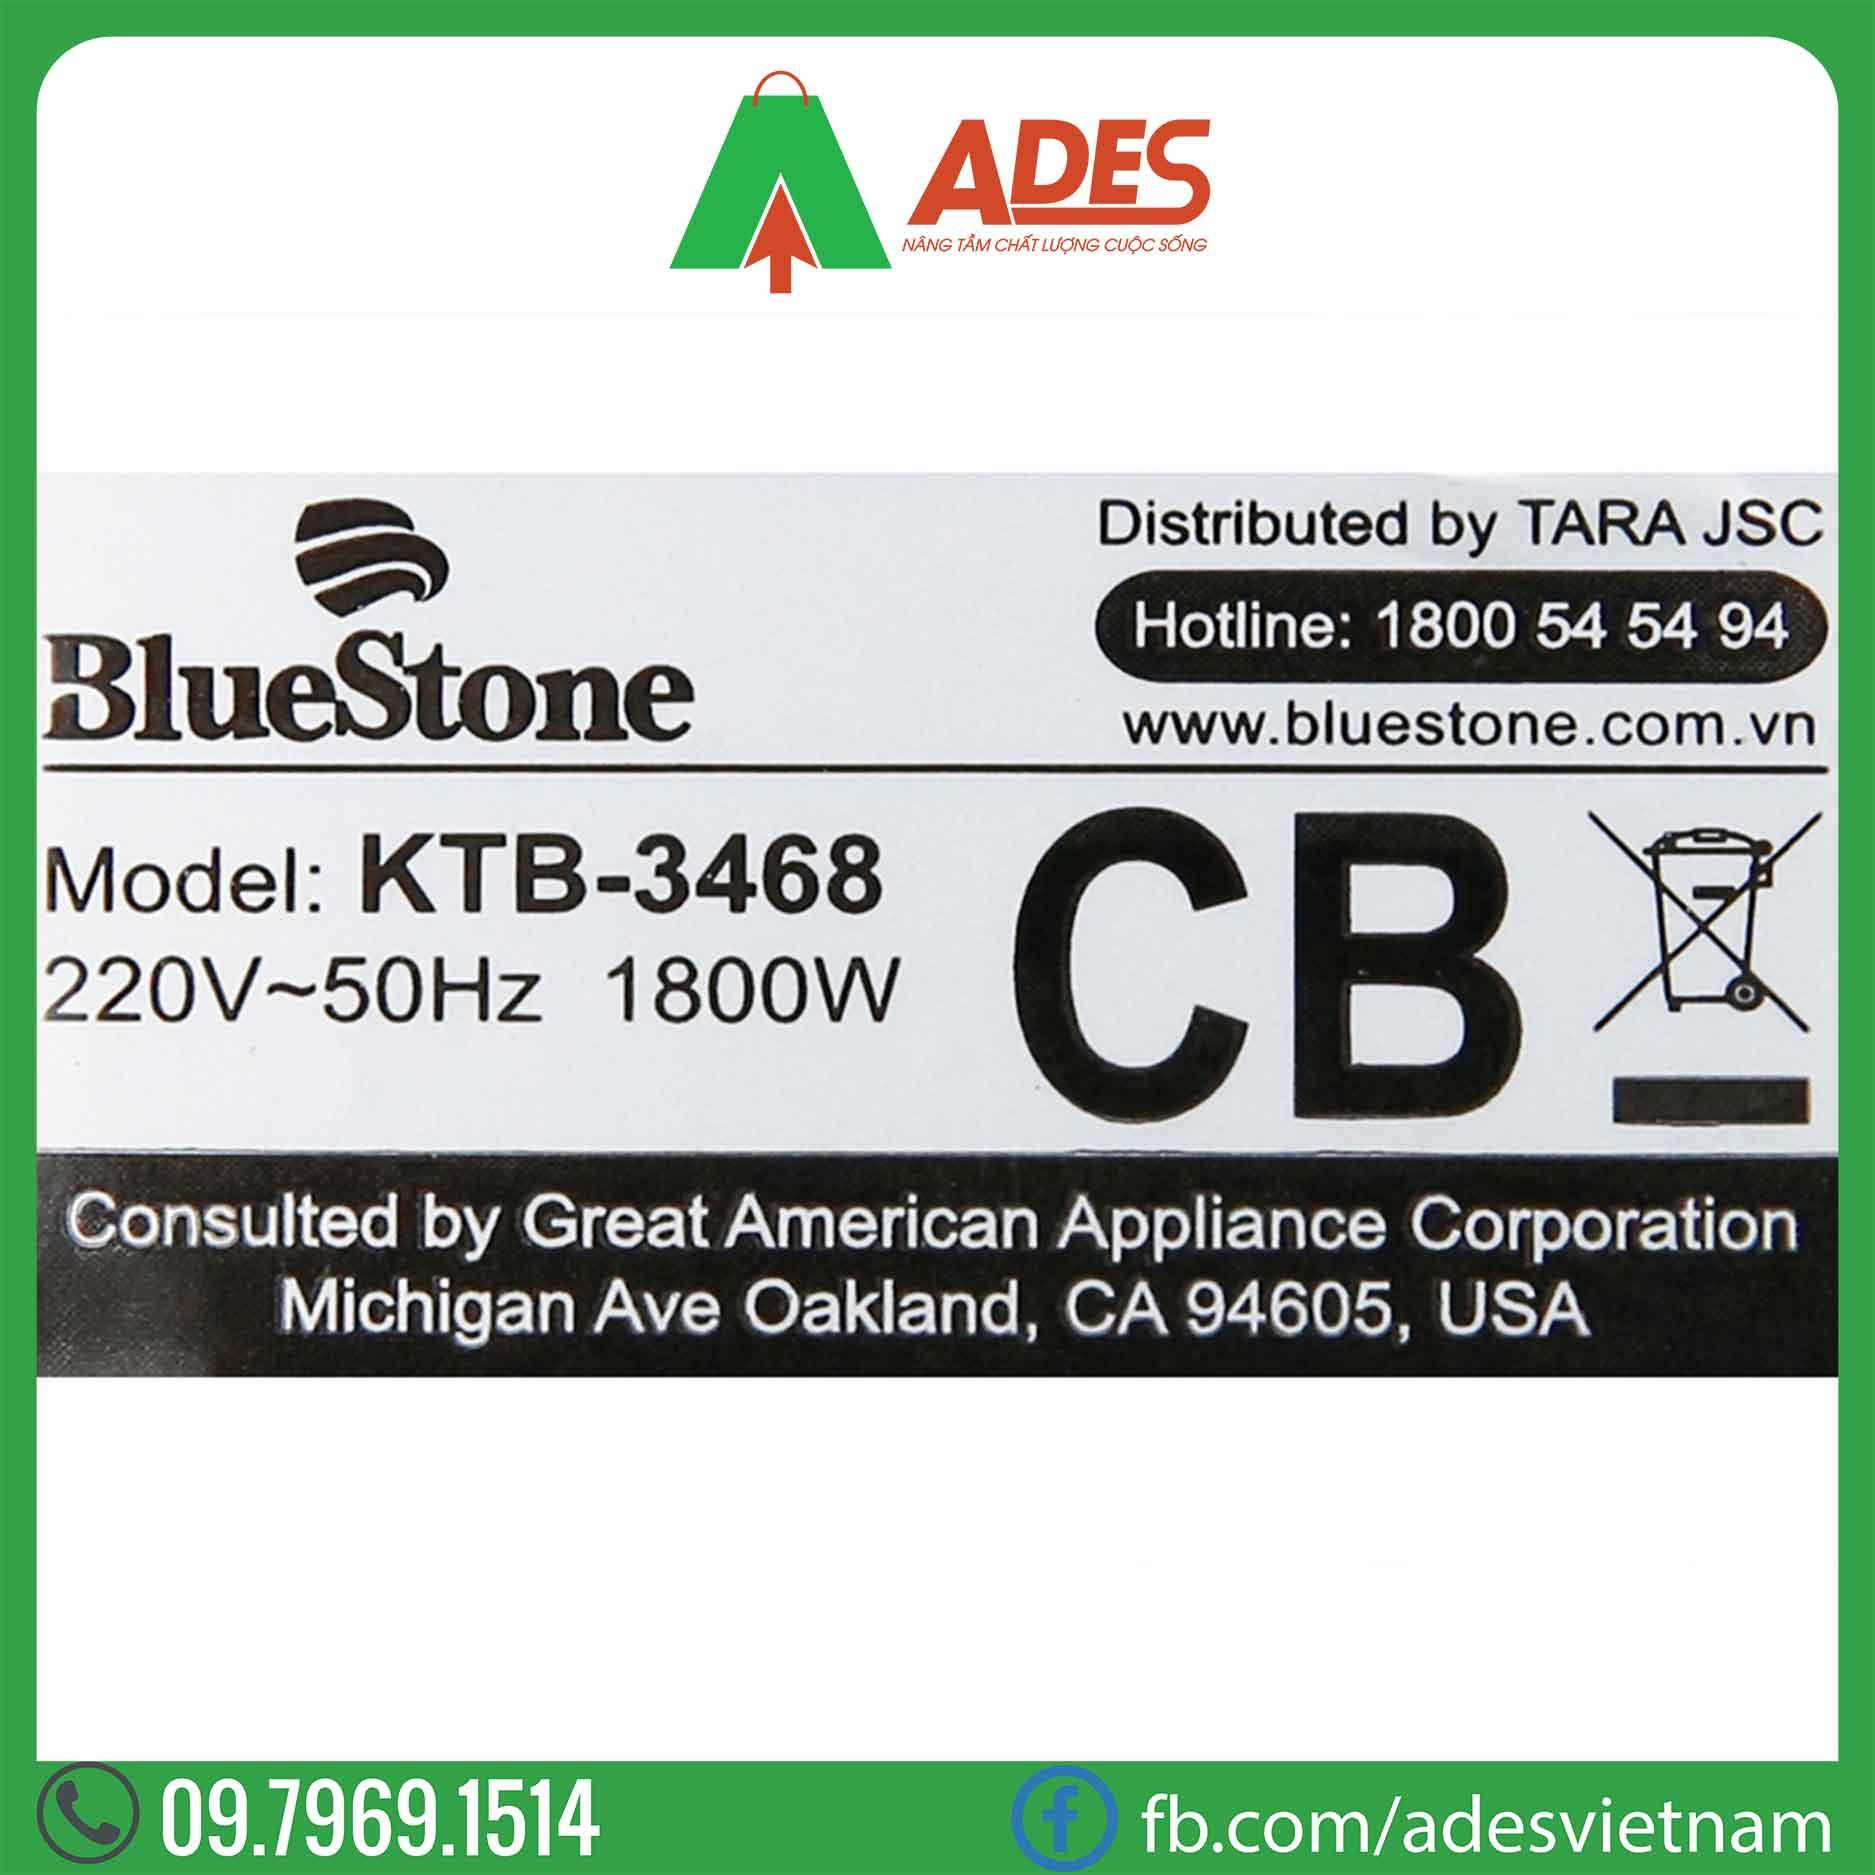 Am sieu toc Bluestone KTB-3468